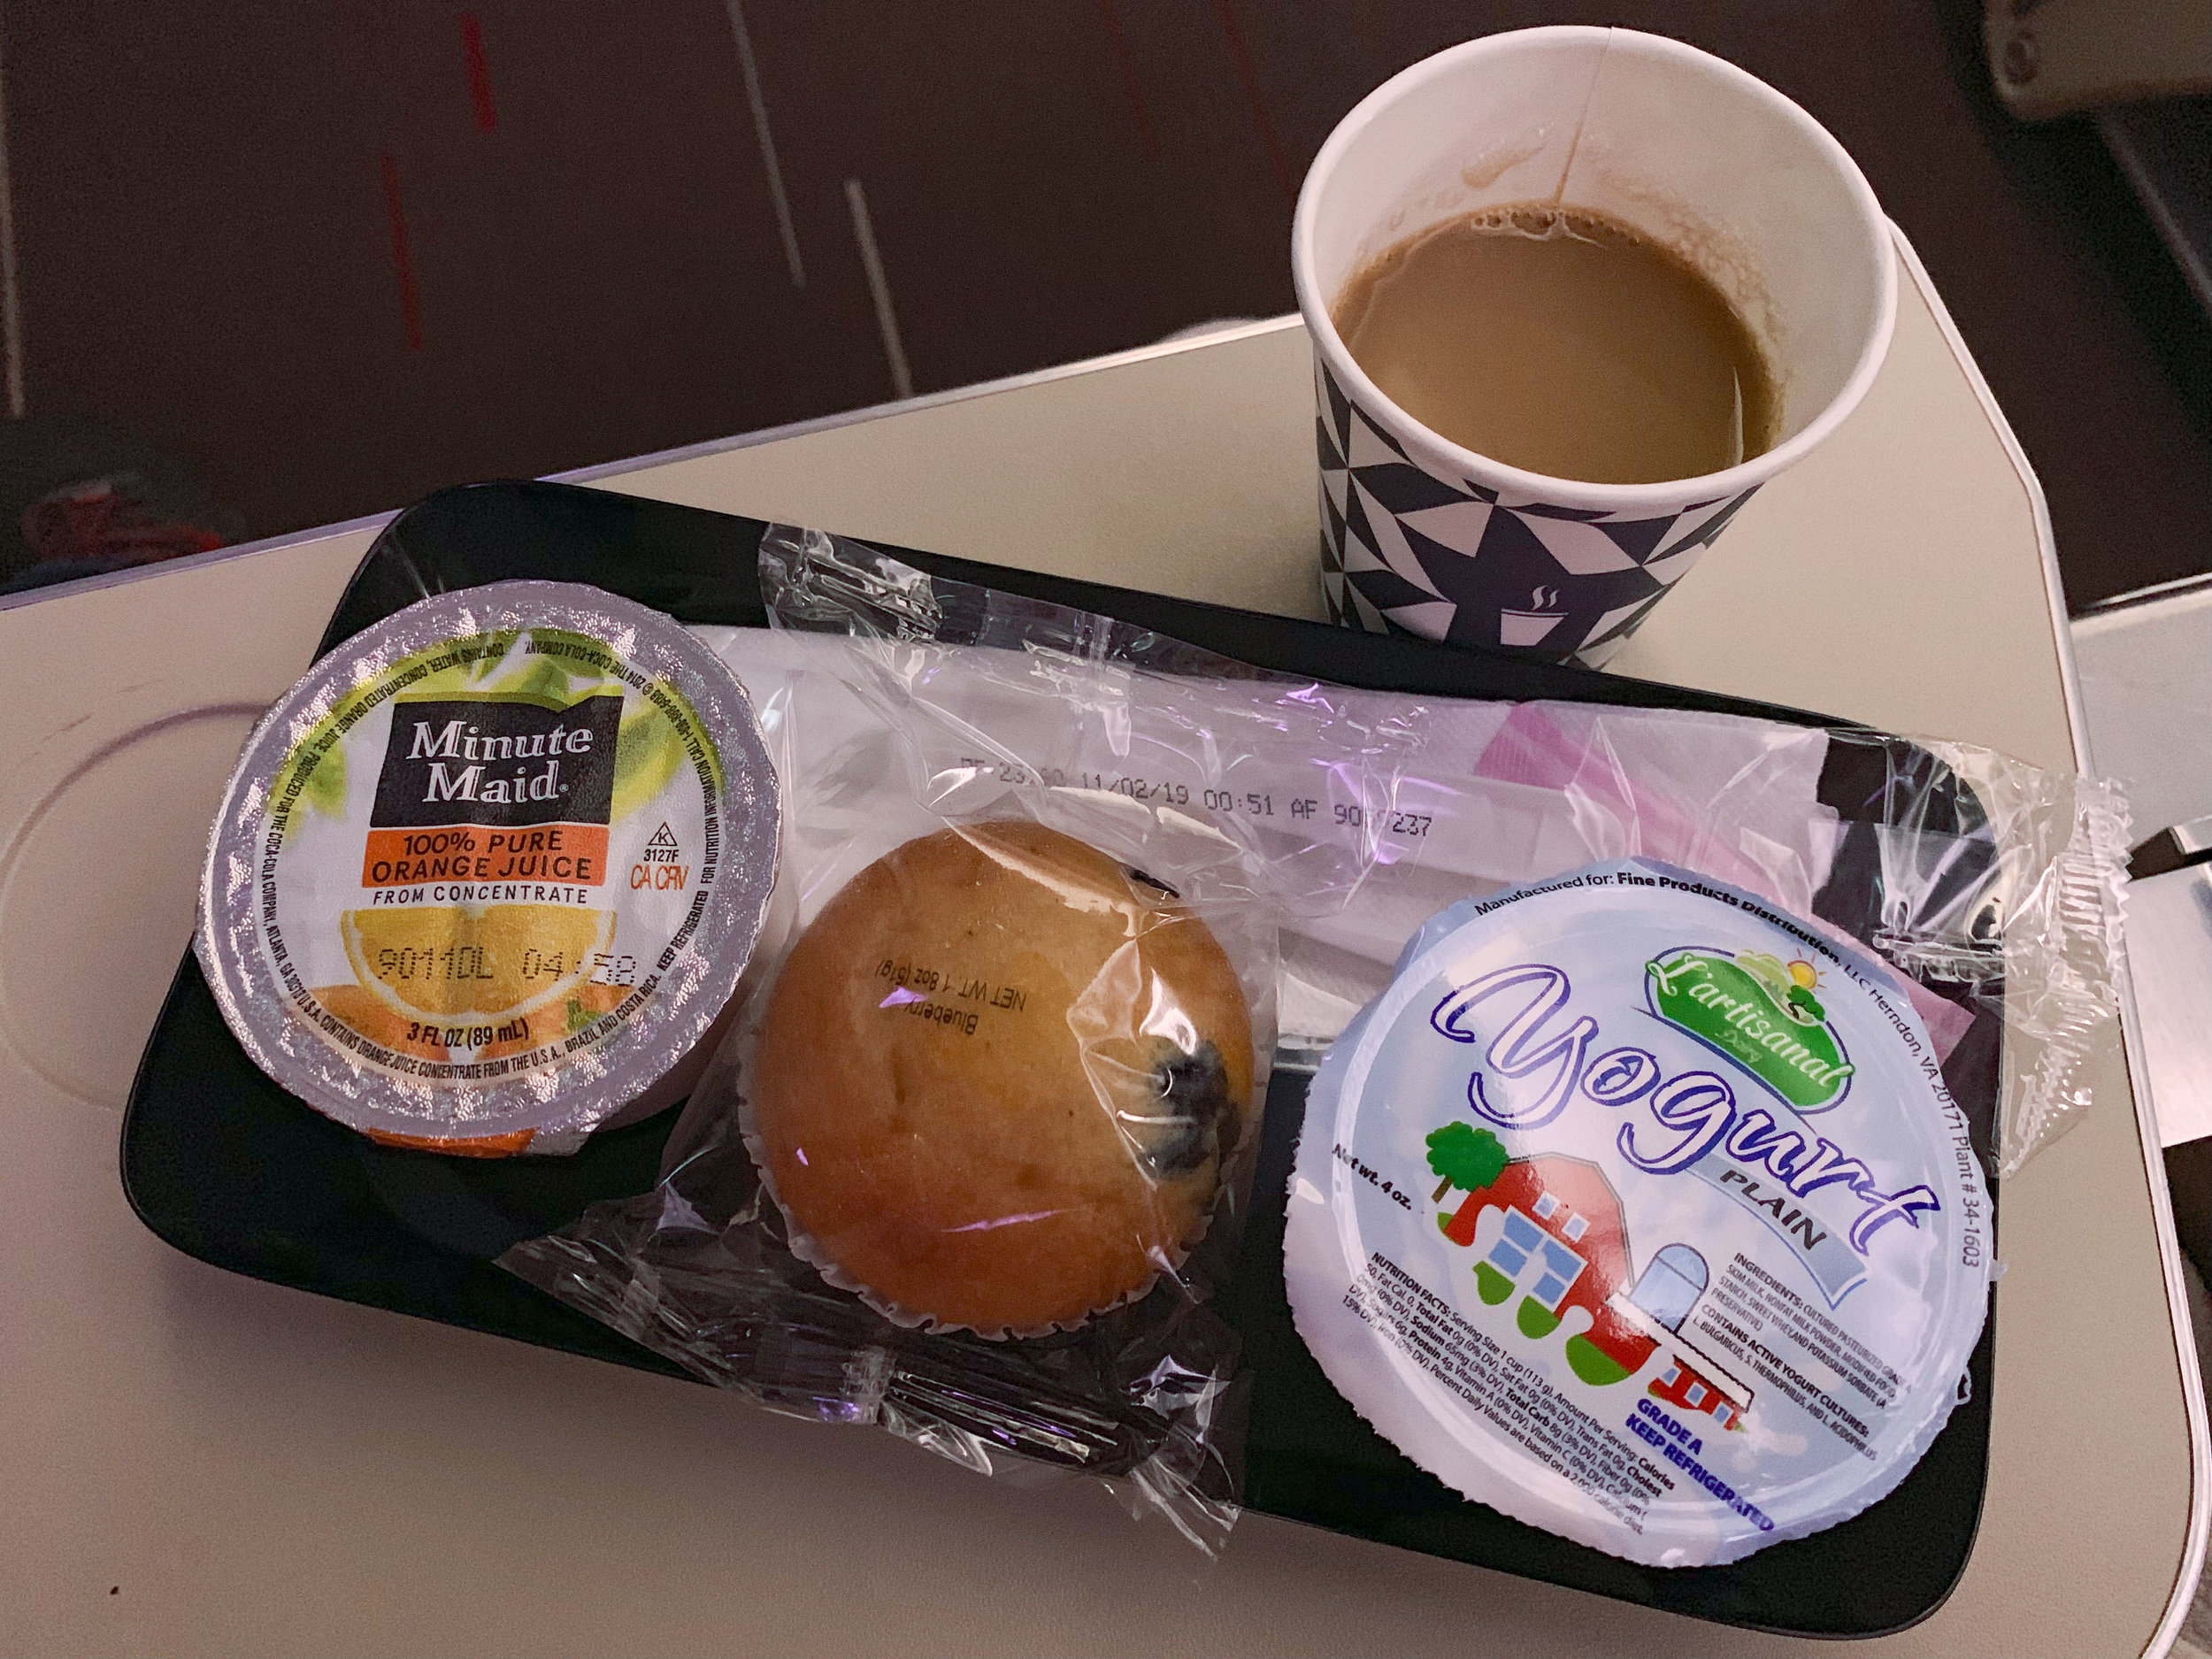 The light breakfast meal.